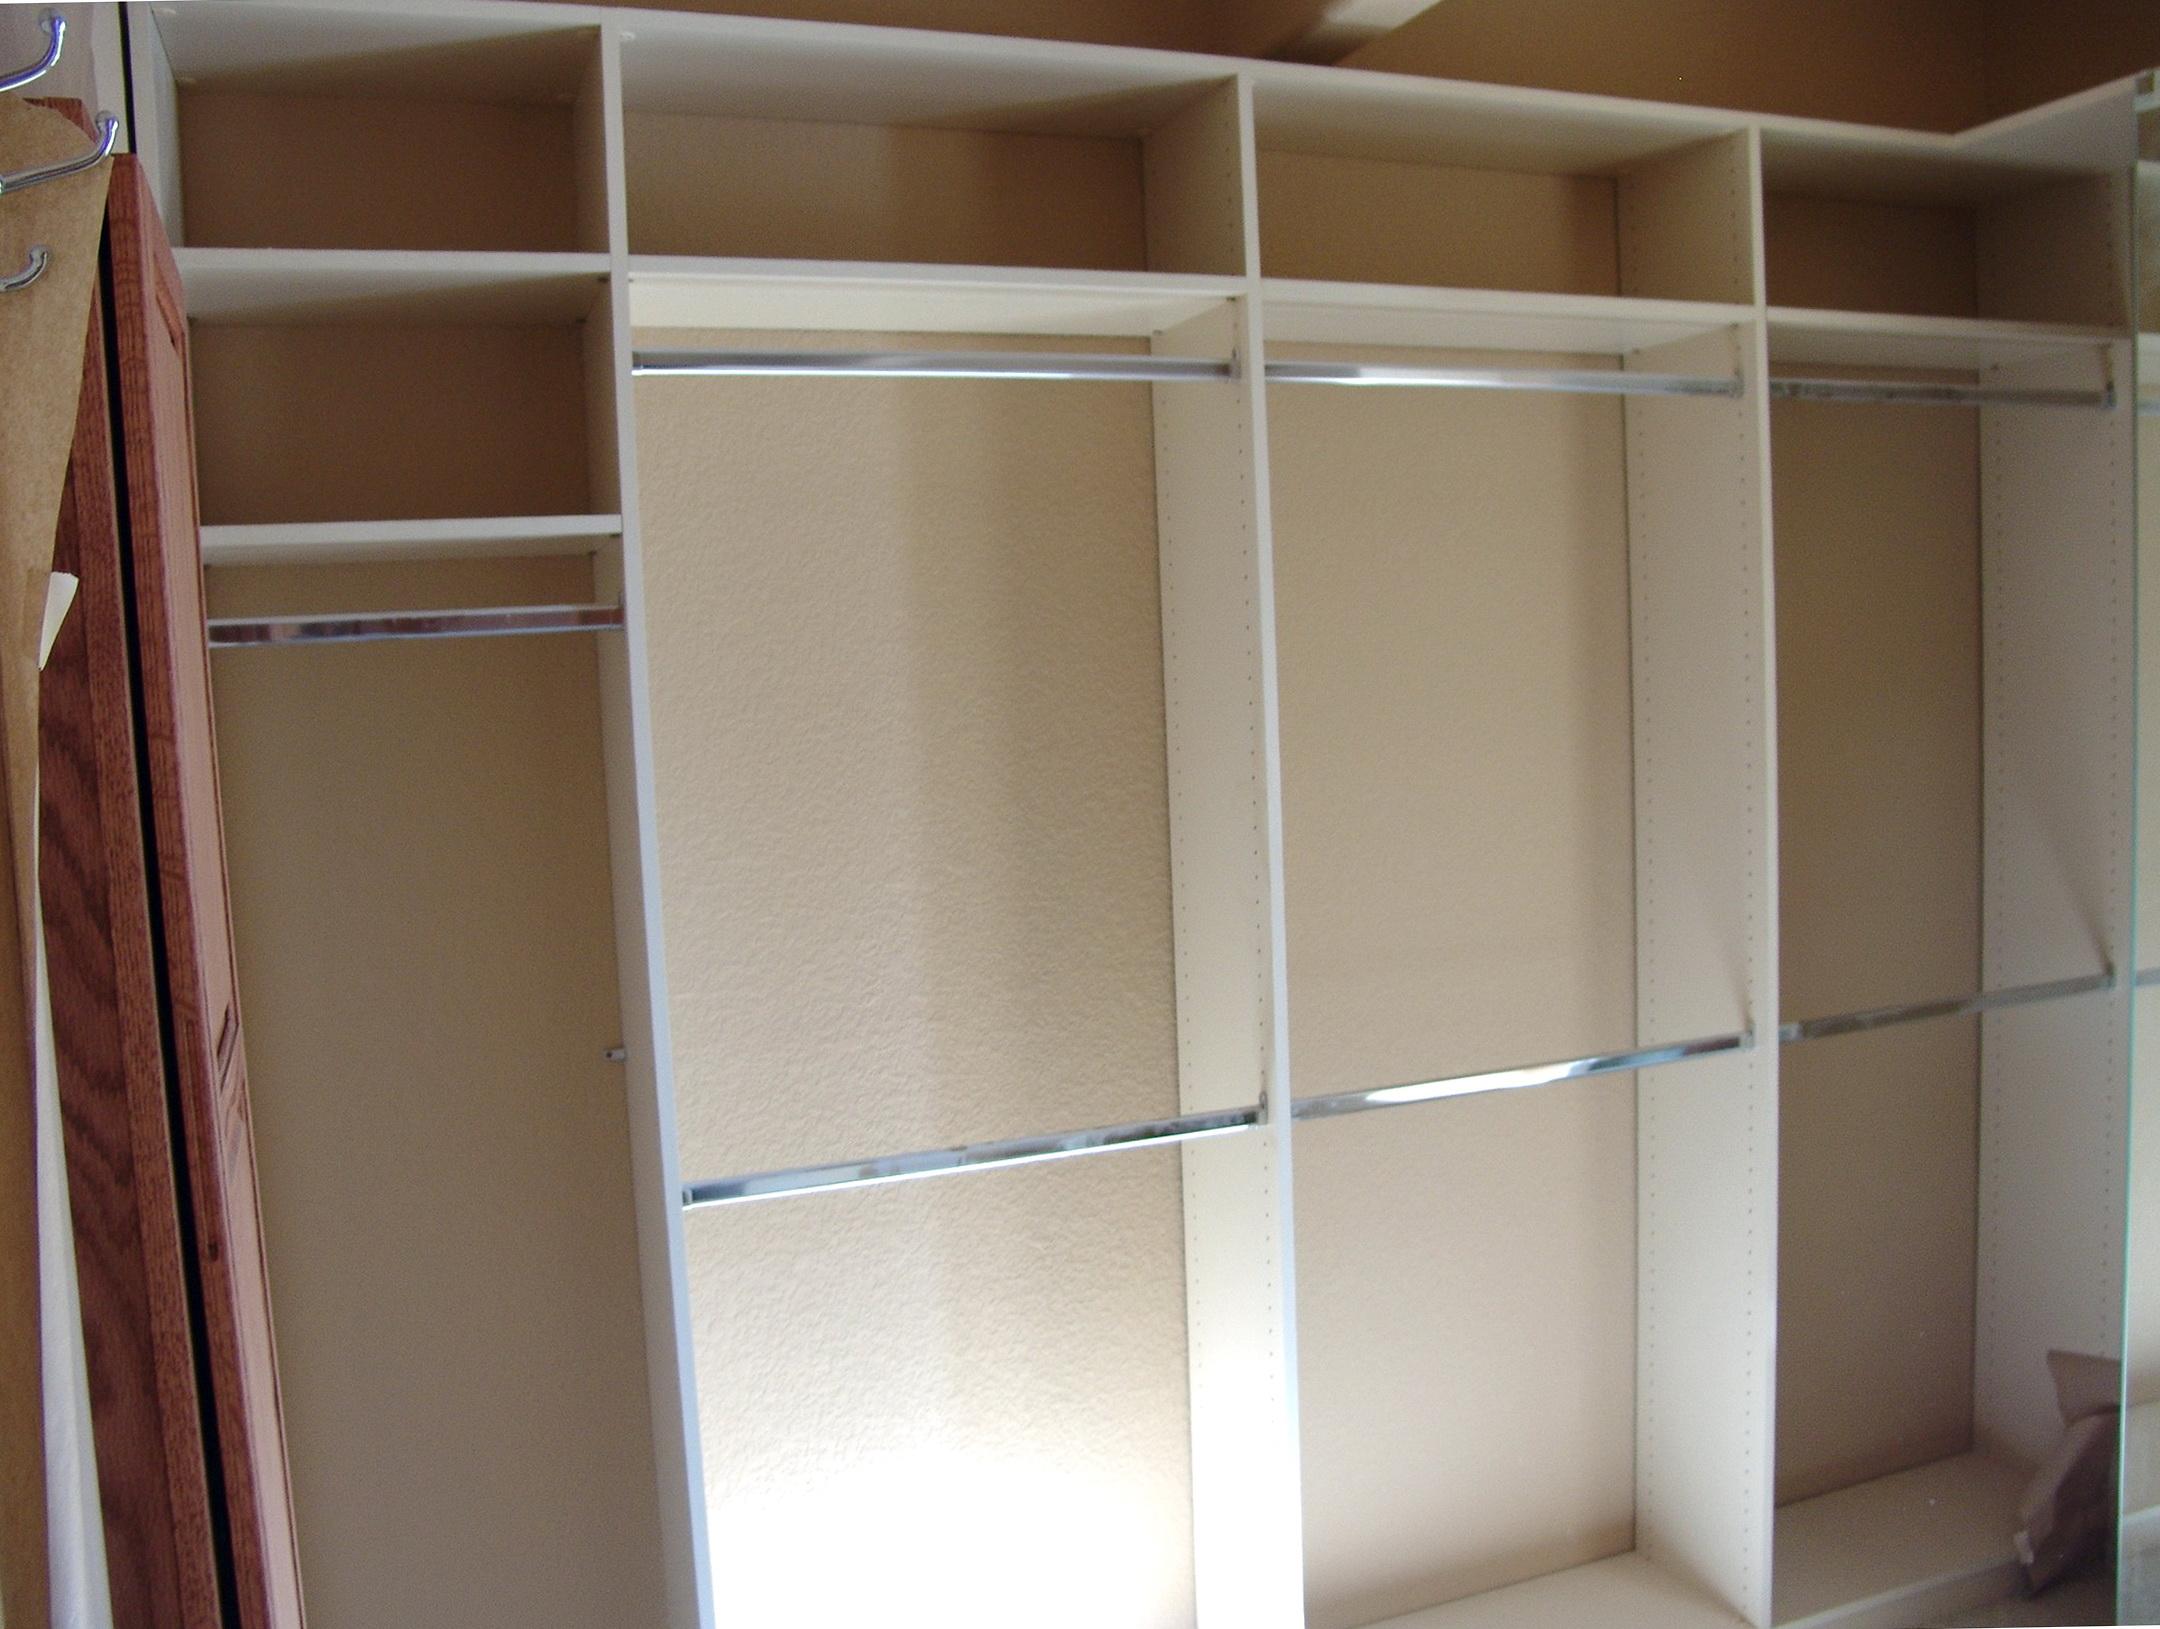 built in closet shelving plans home design ideas. Black Bedroom Furniture Sets. Home Design Ideas